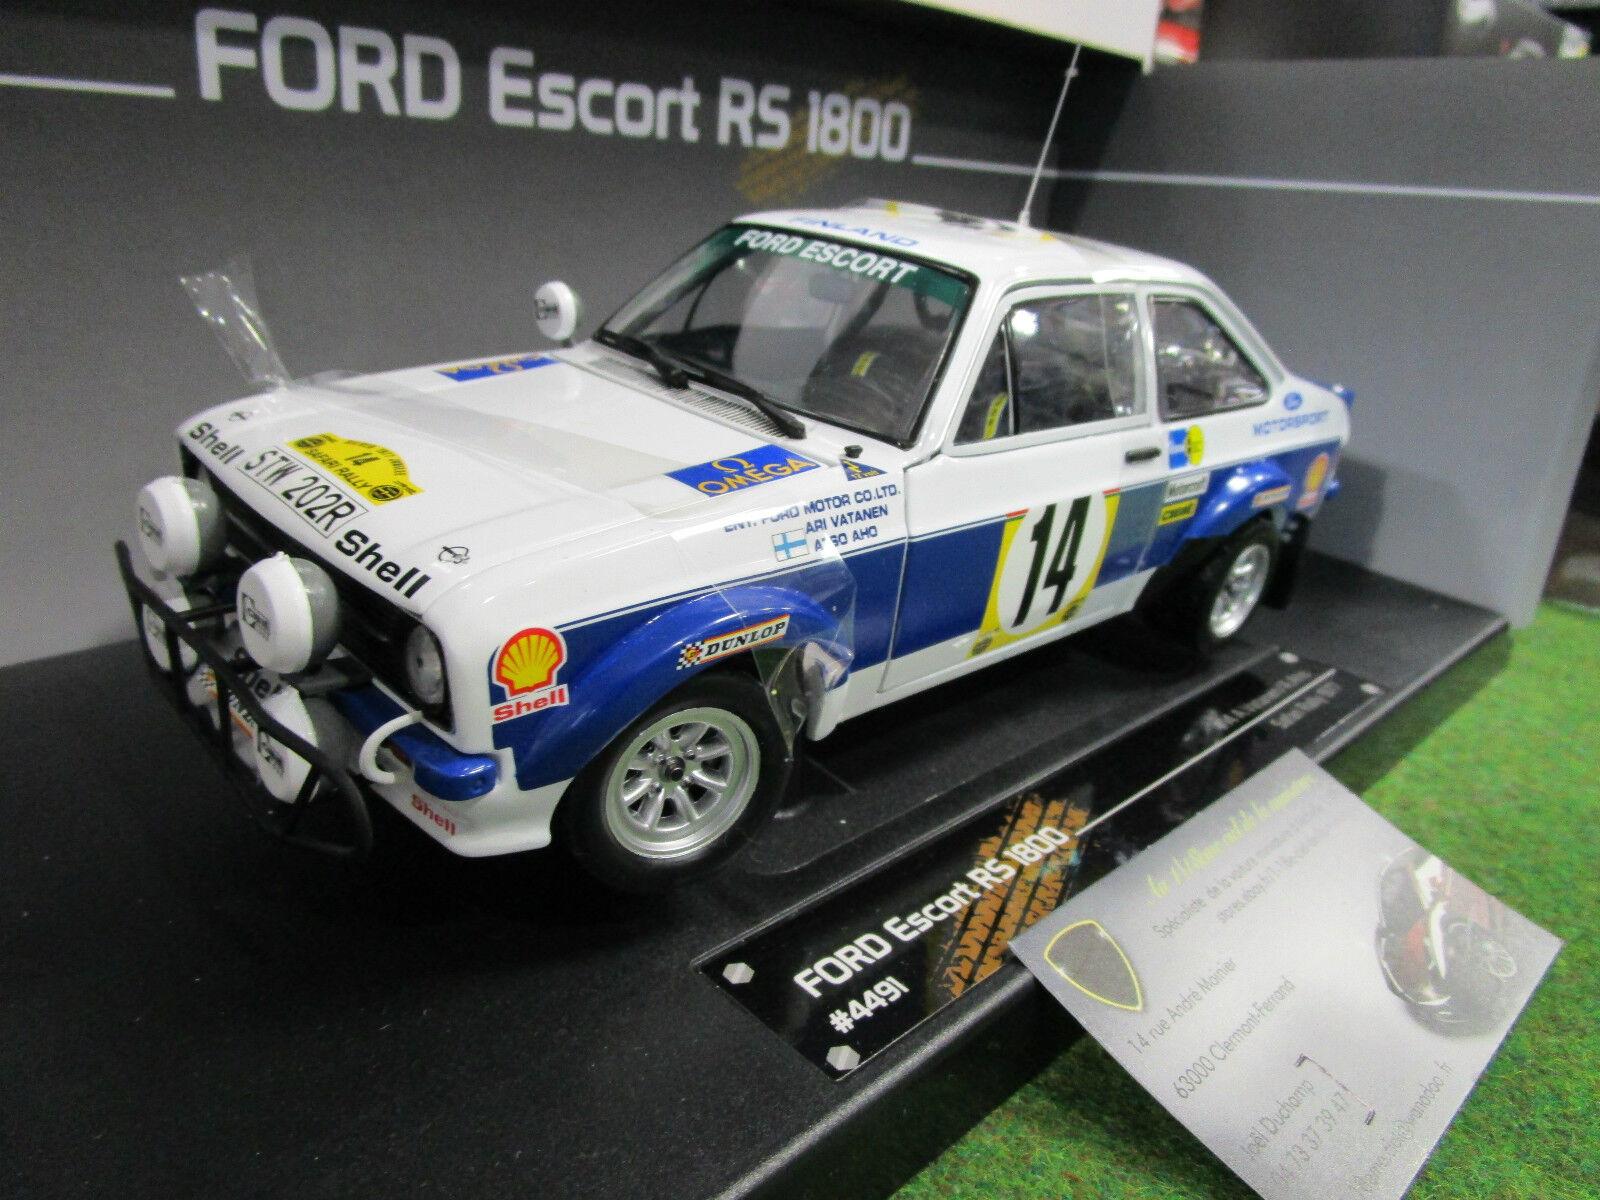 FORD ESCORT MKII RS1800 Rallye   14 SAFARI Rally 1977 1 18 SUN Estrella 4491 voiture